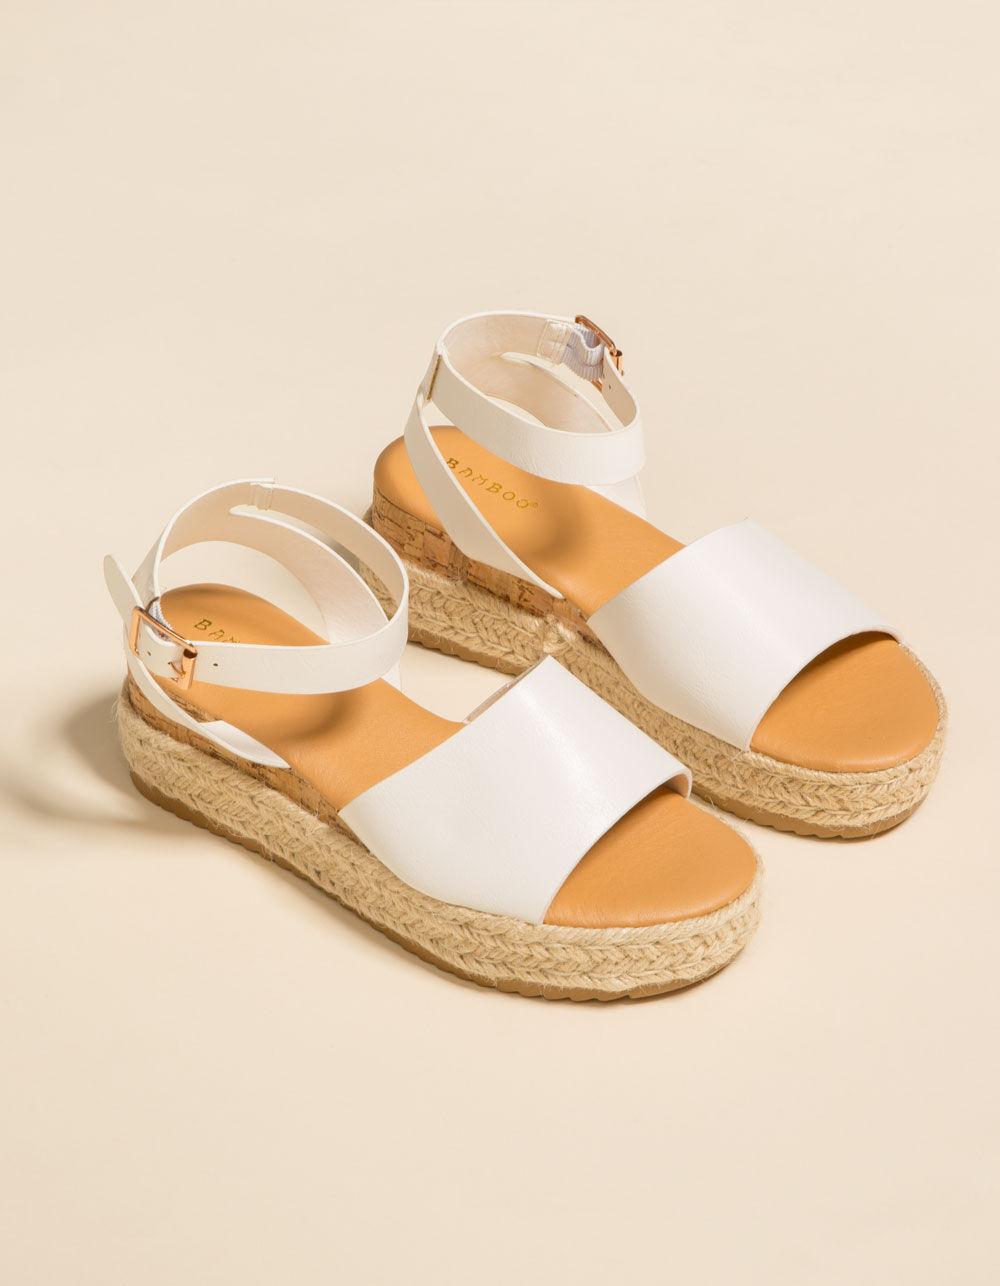 BAMBOO Jute Ankle Wrap White Espadrille Flatform Sandals